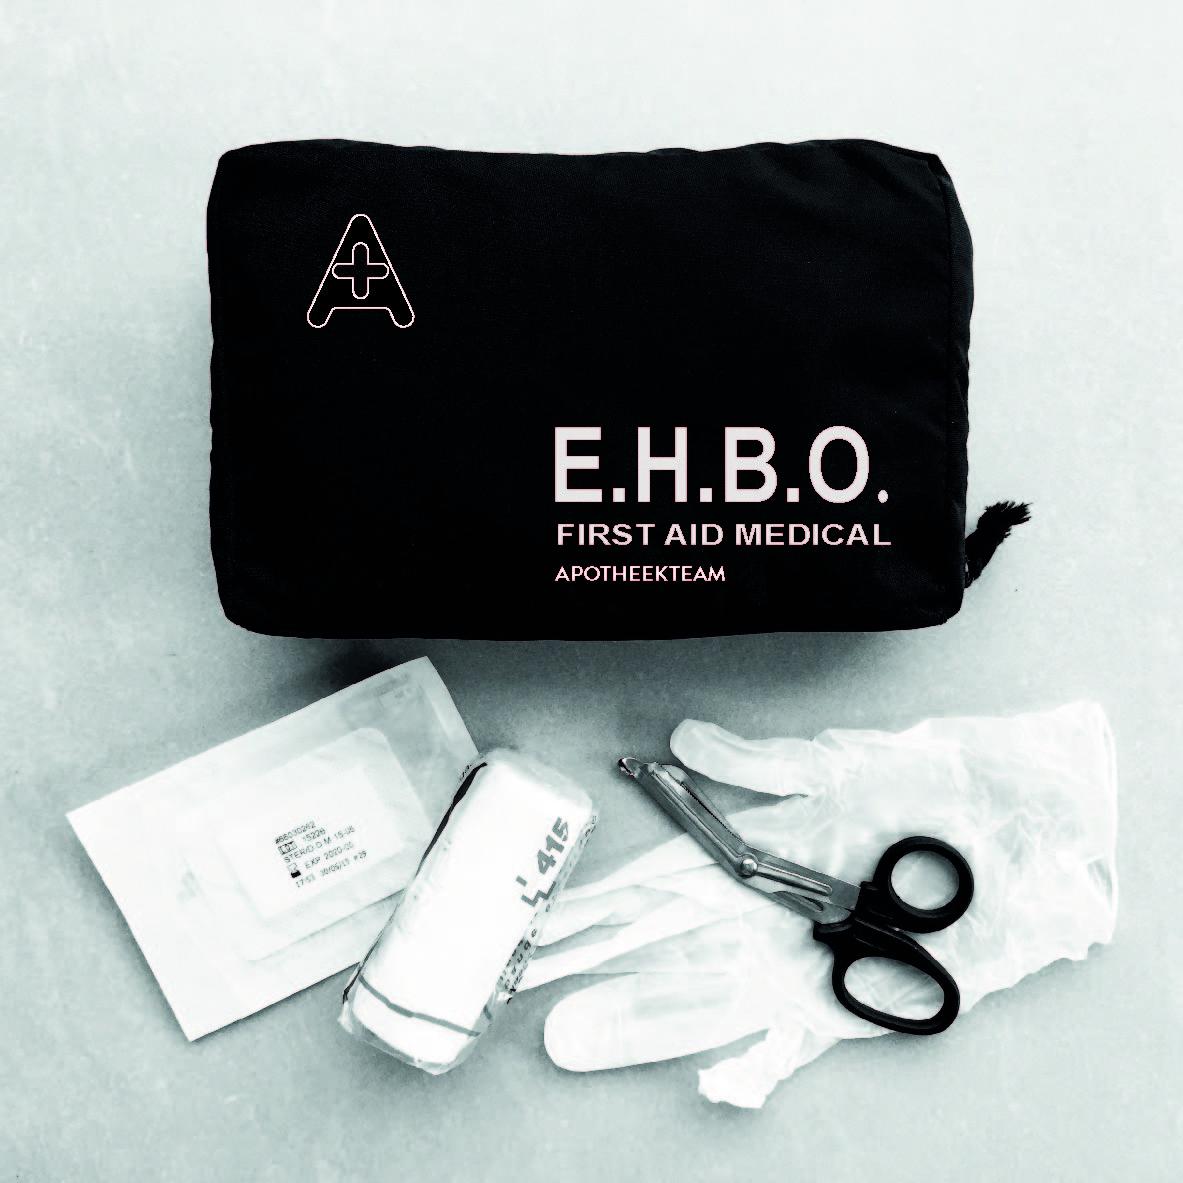 EHBO koffer verkrijgbaar bij Apotheekteam